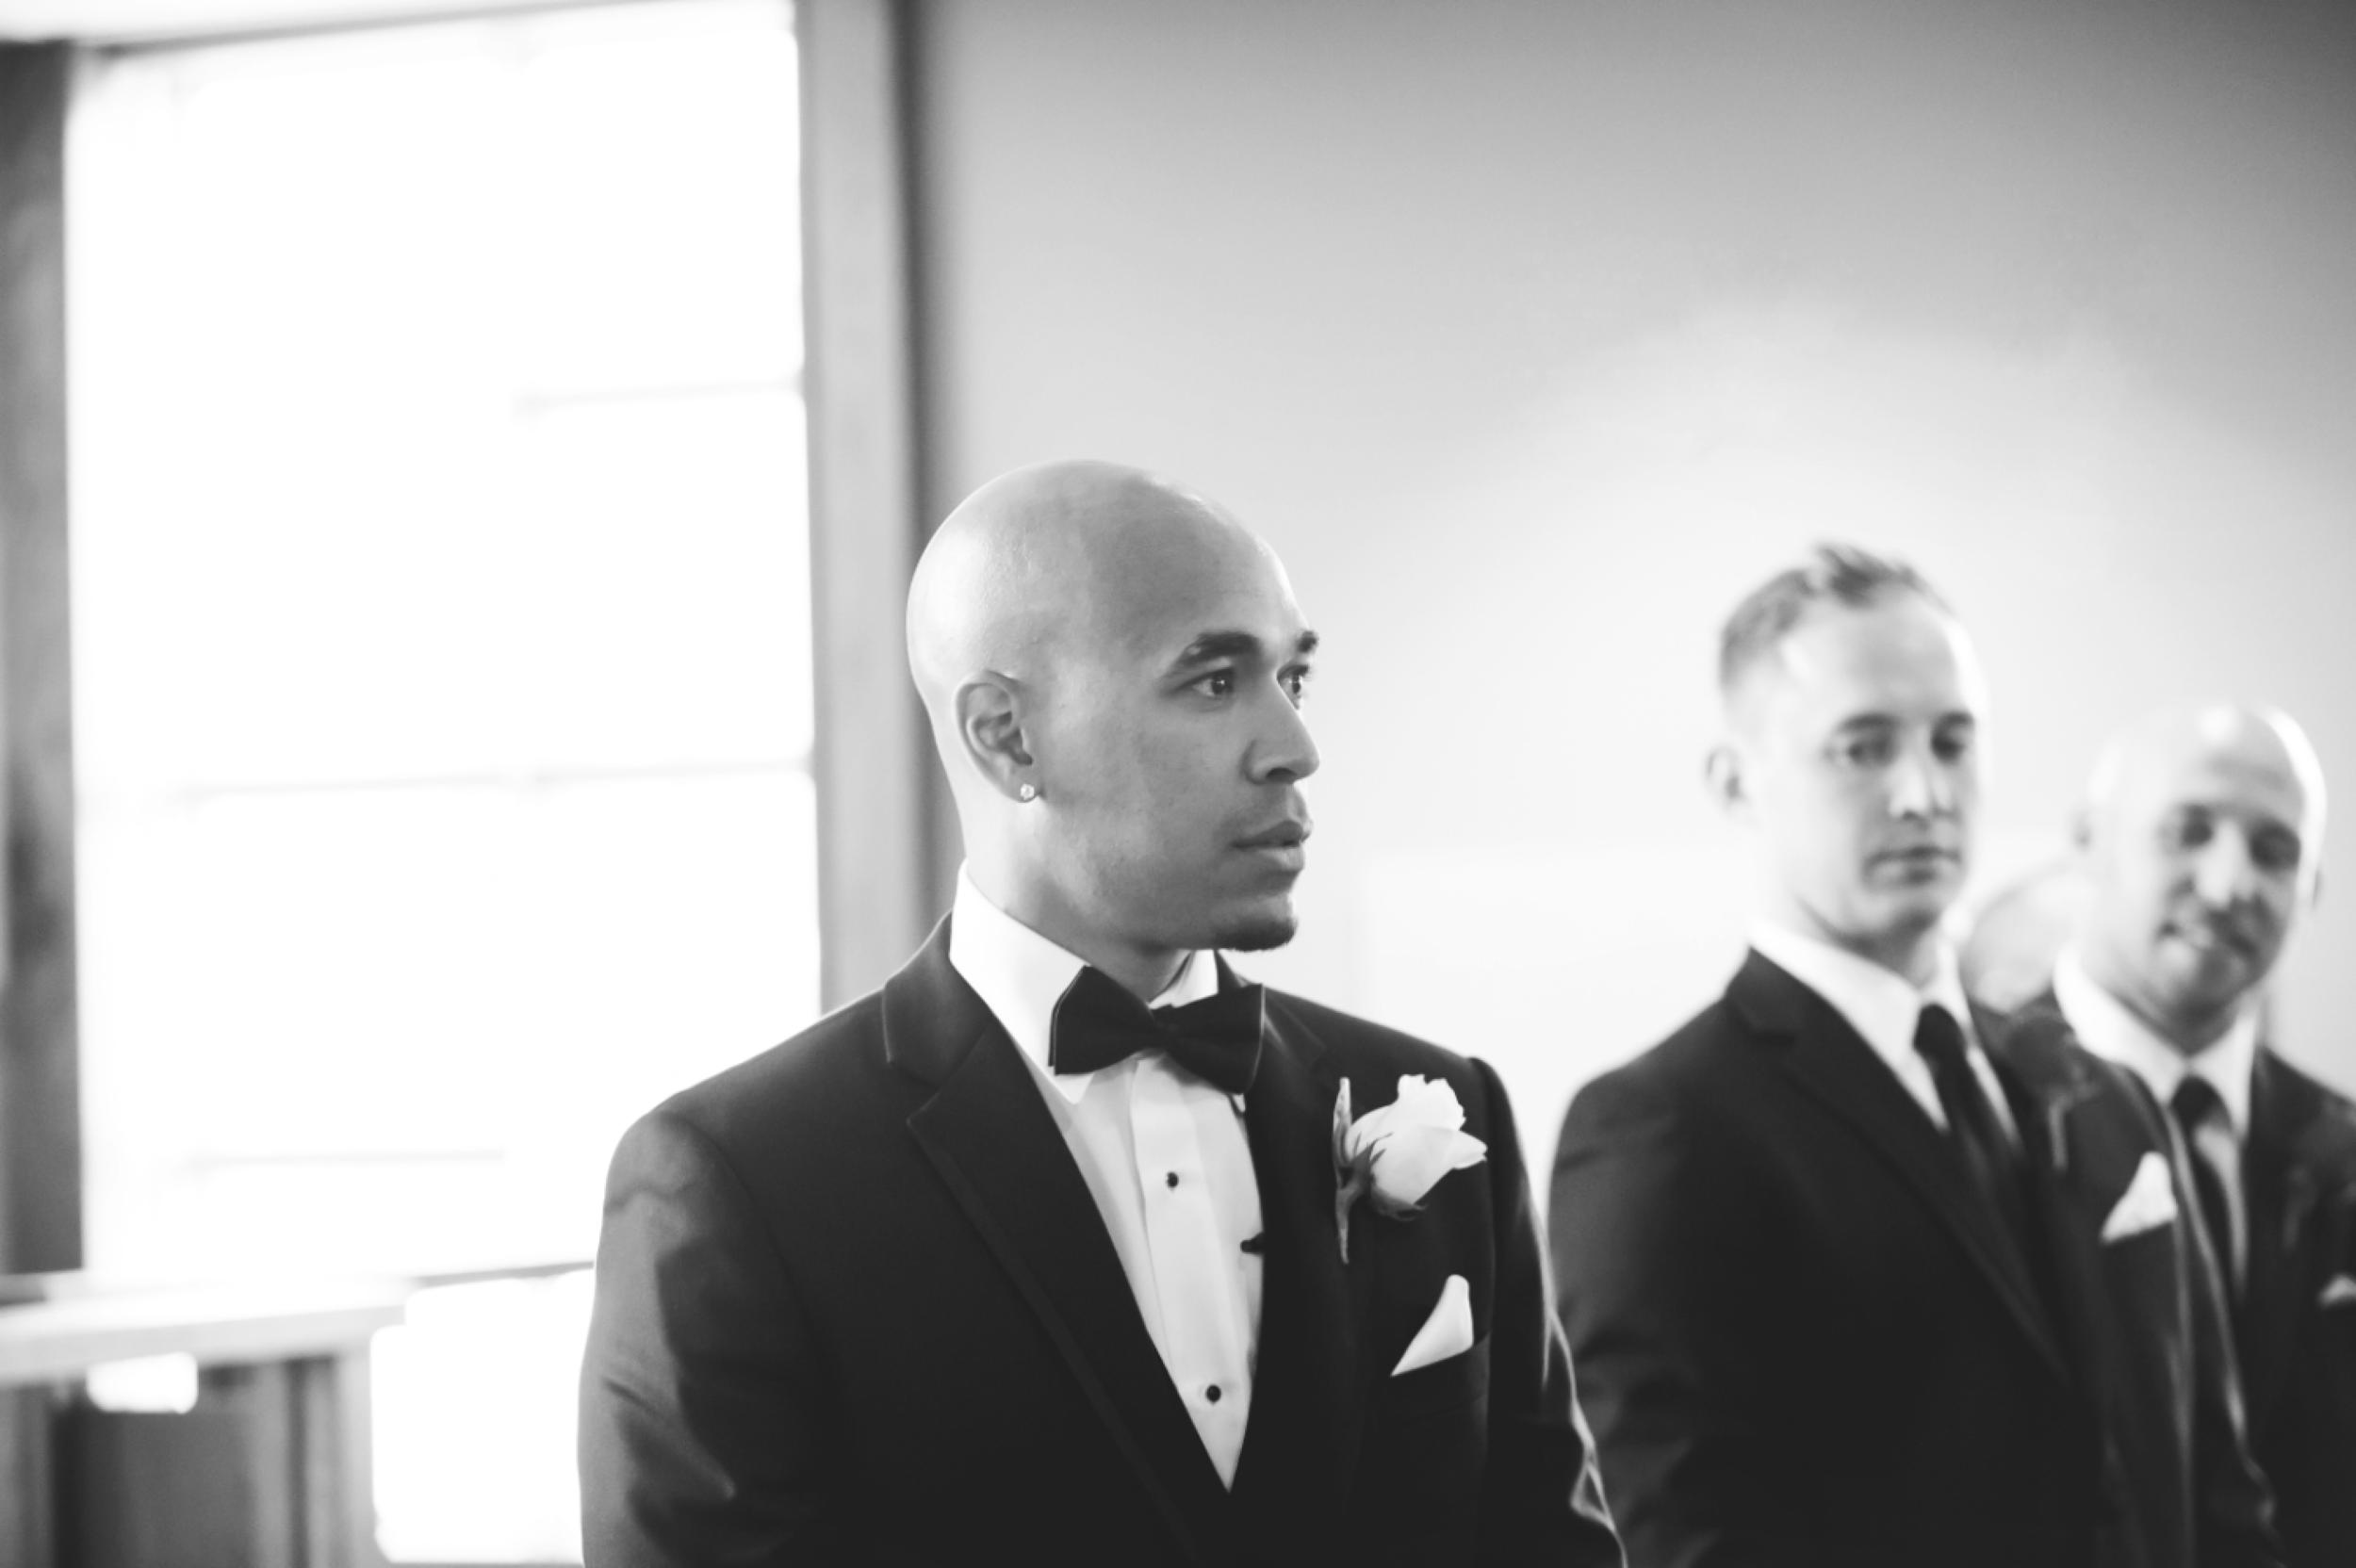 Wedding-Burlington-Convention-Center-Burlington-Oakville-Toronto-Hamilton-Niagara-Wedding-Photographer-Photography-Moments-by-Lauren-Photo-Image-15.png